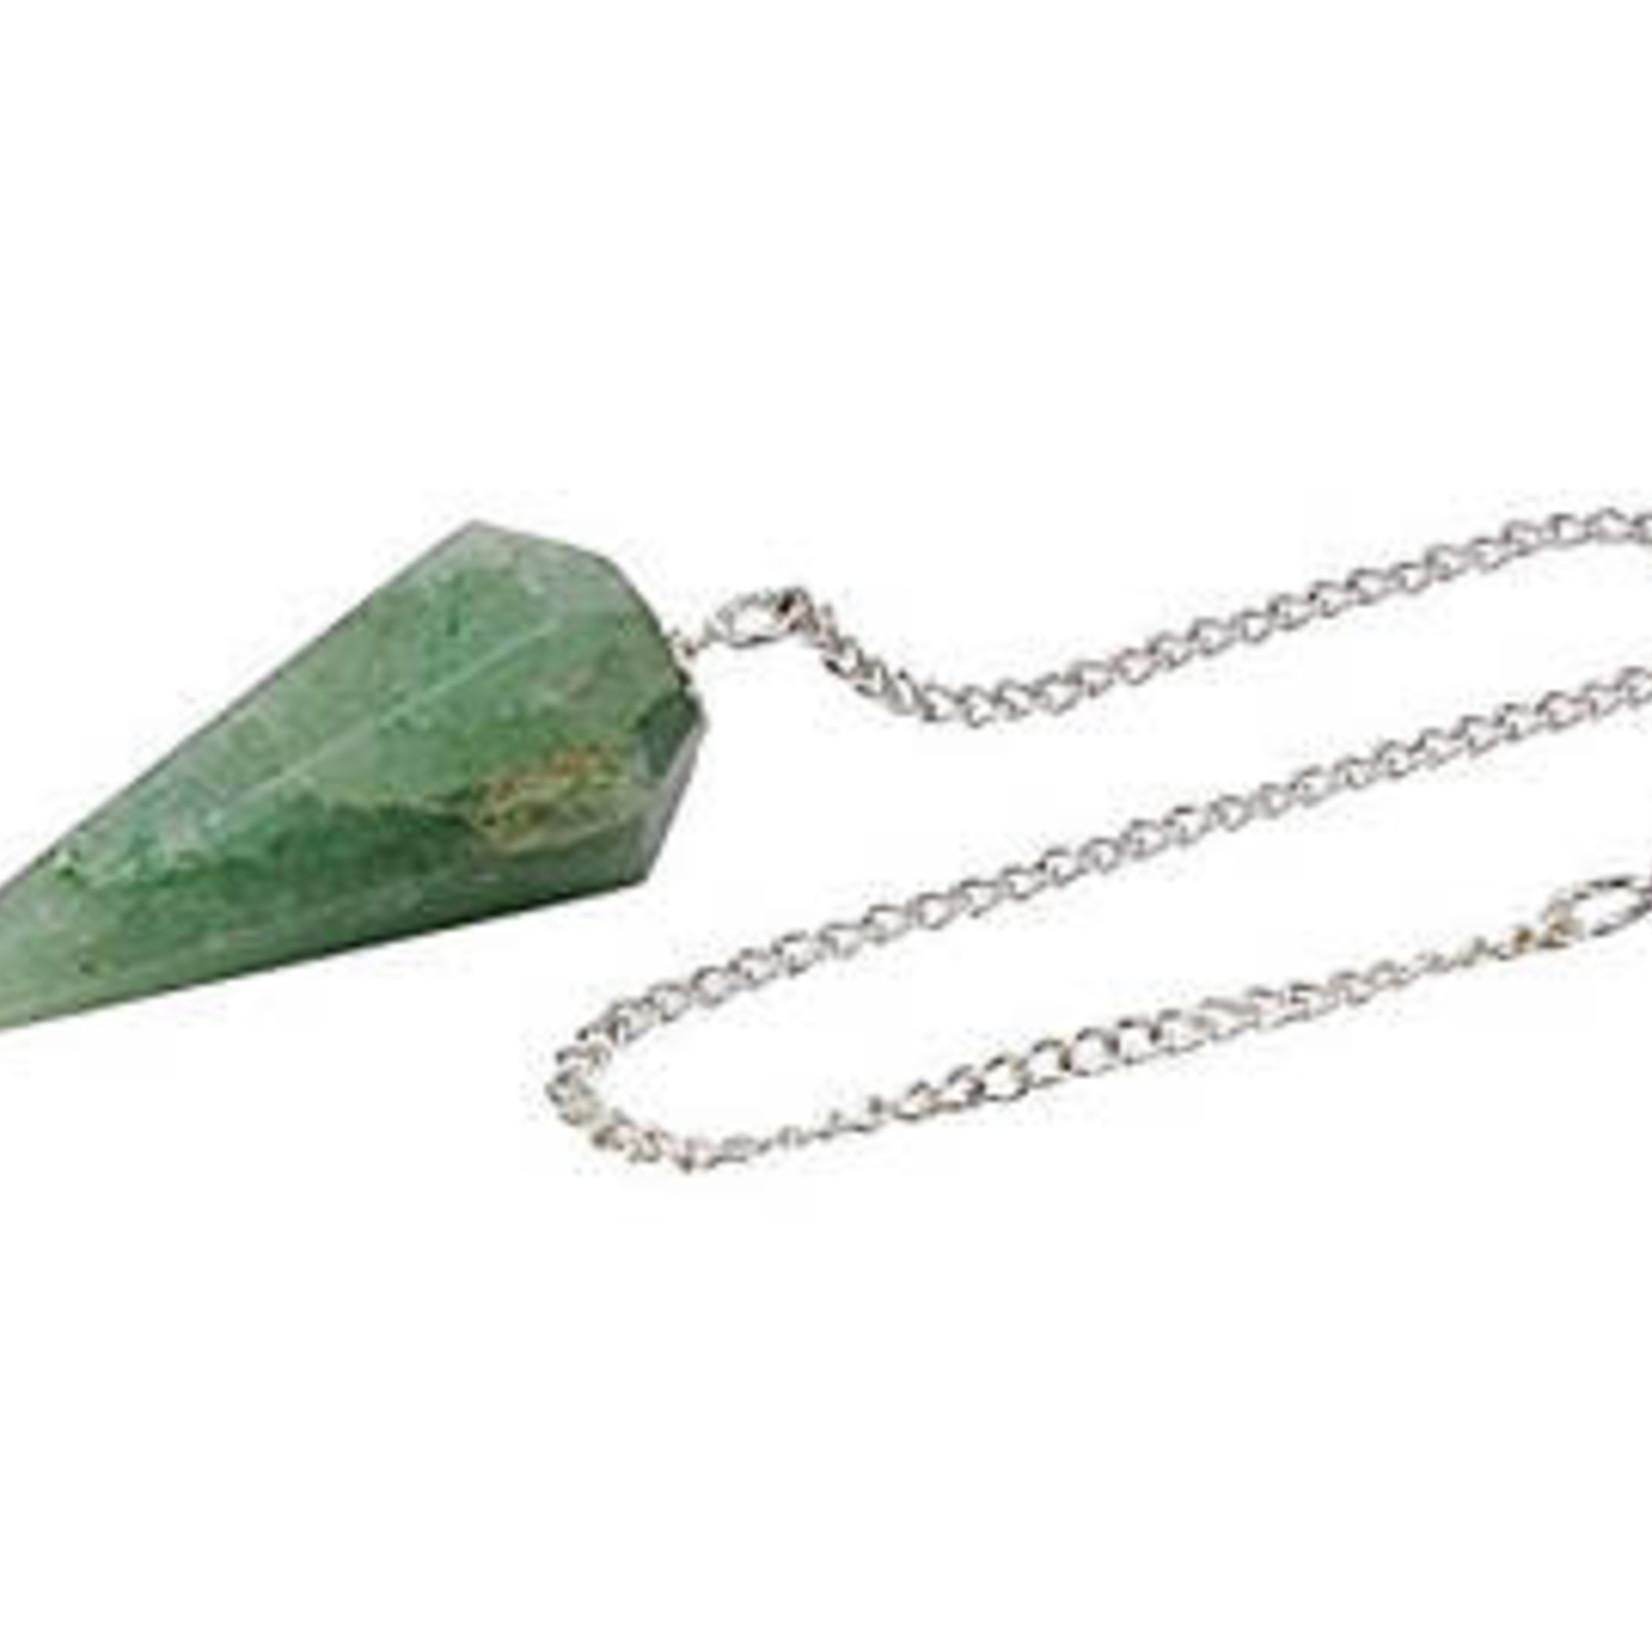 Nephrite Jade Pendulum